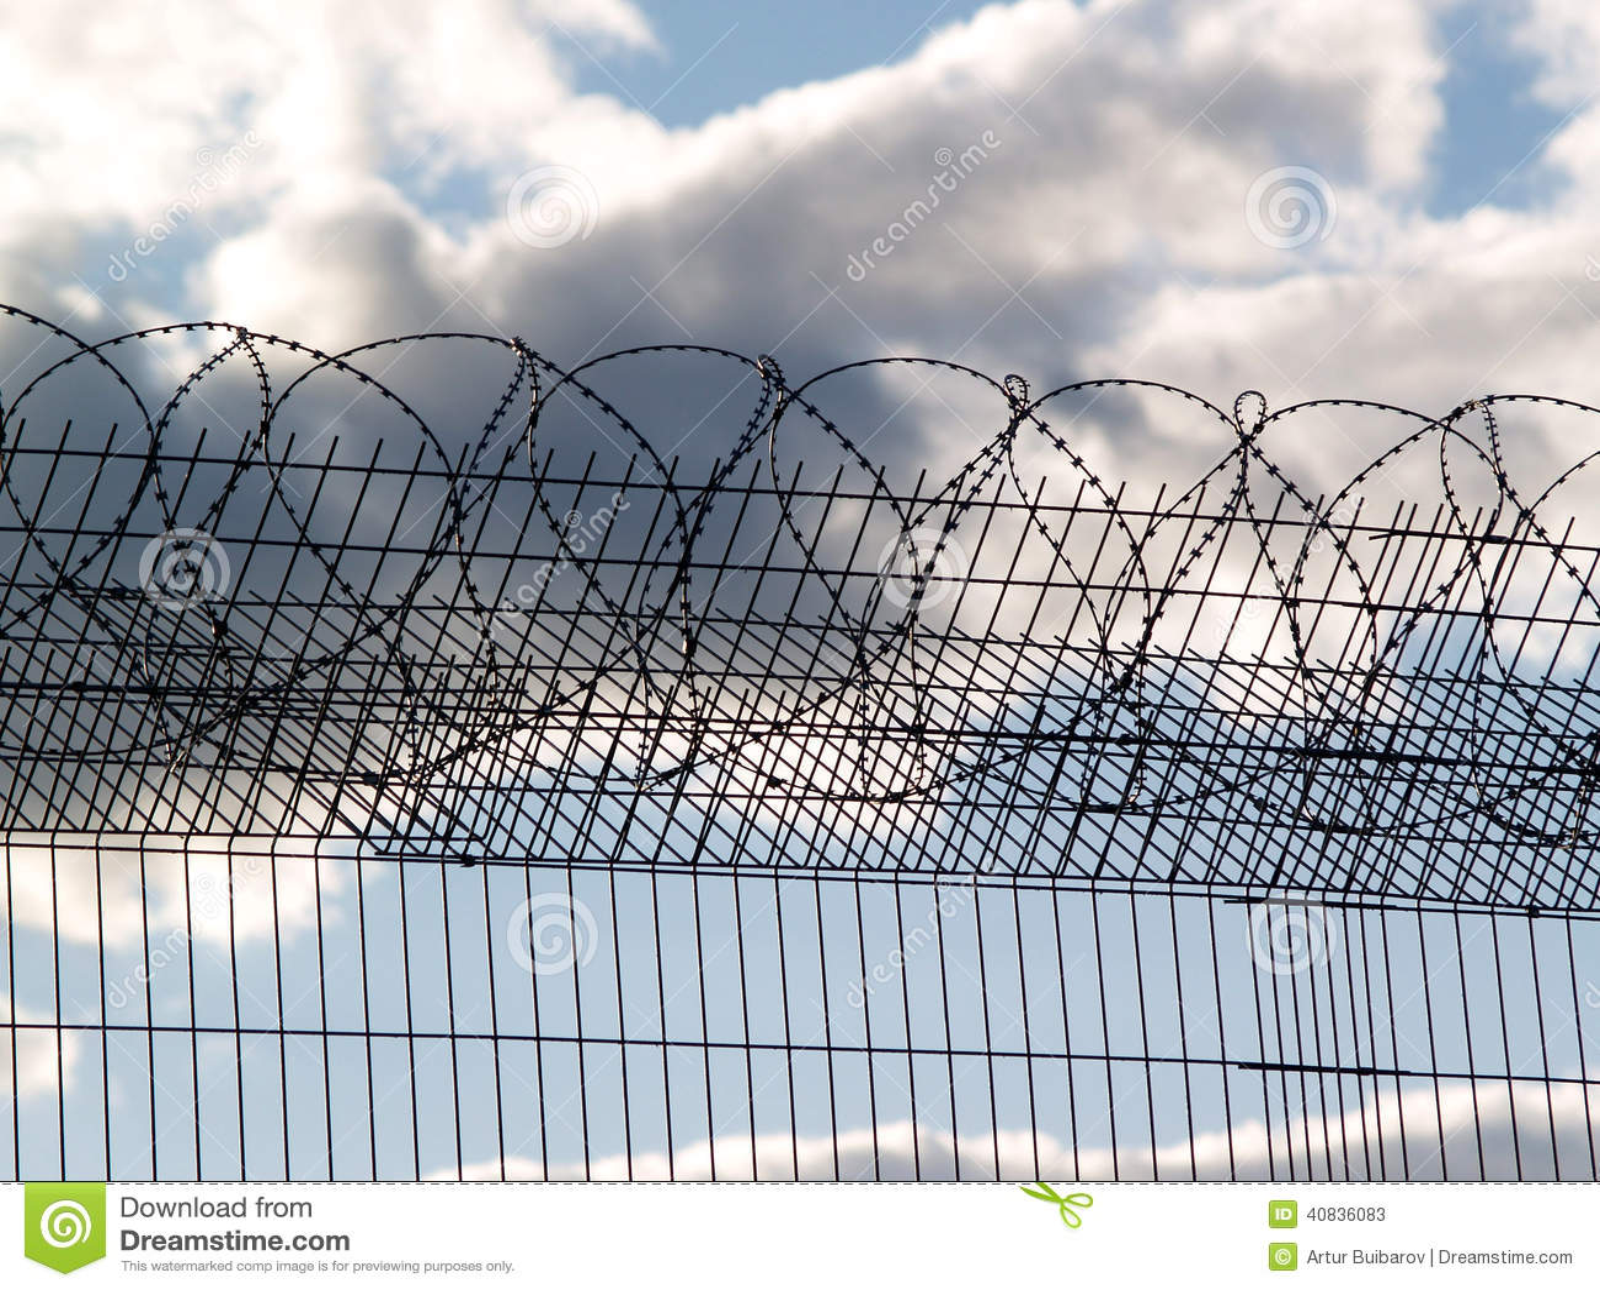 Prison Fence Graphic prison fence graphic